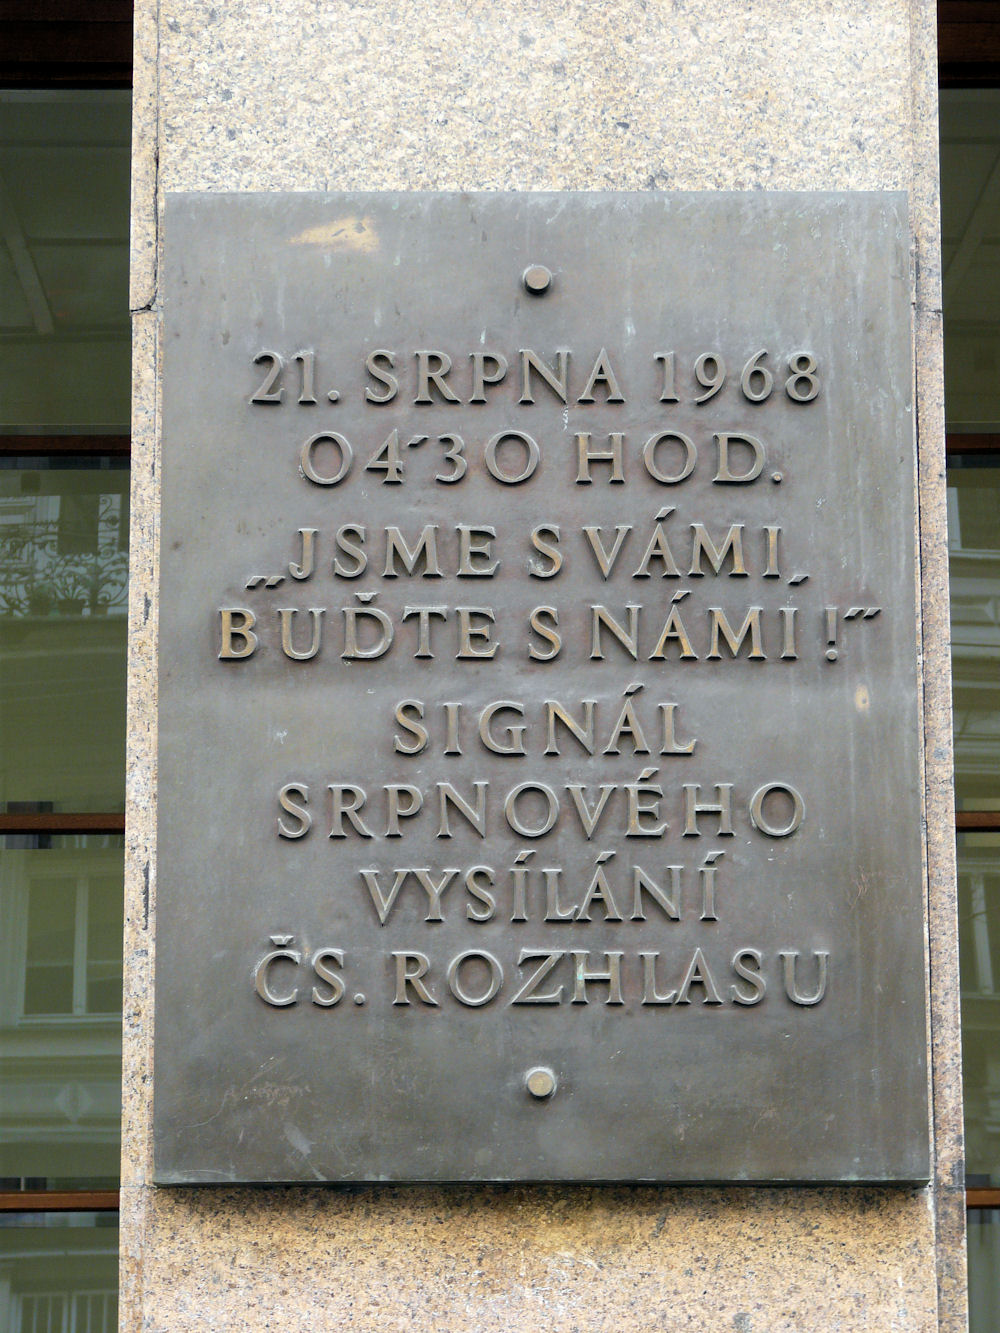 1968 memorial, Czech Radio